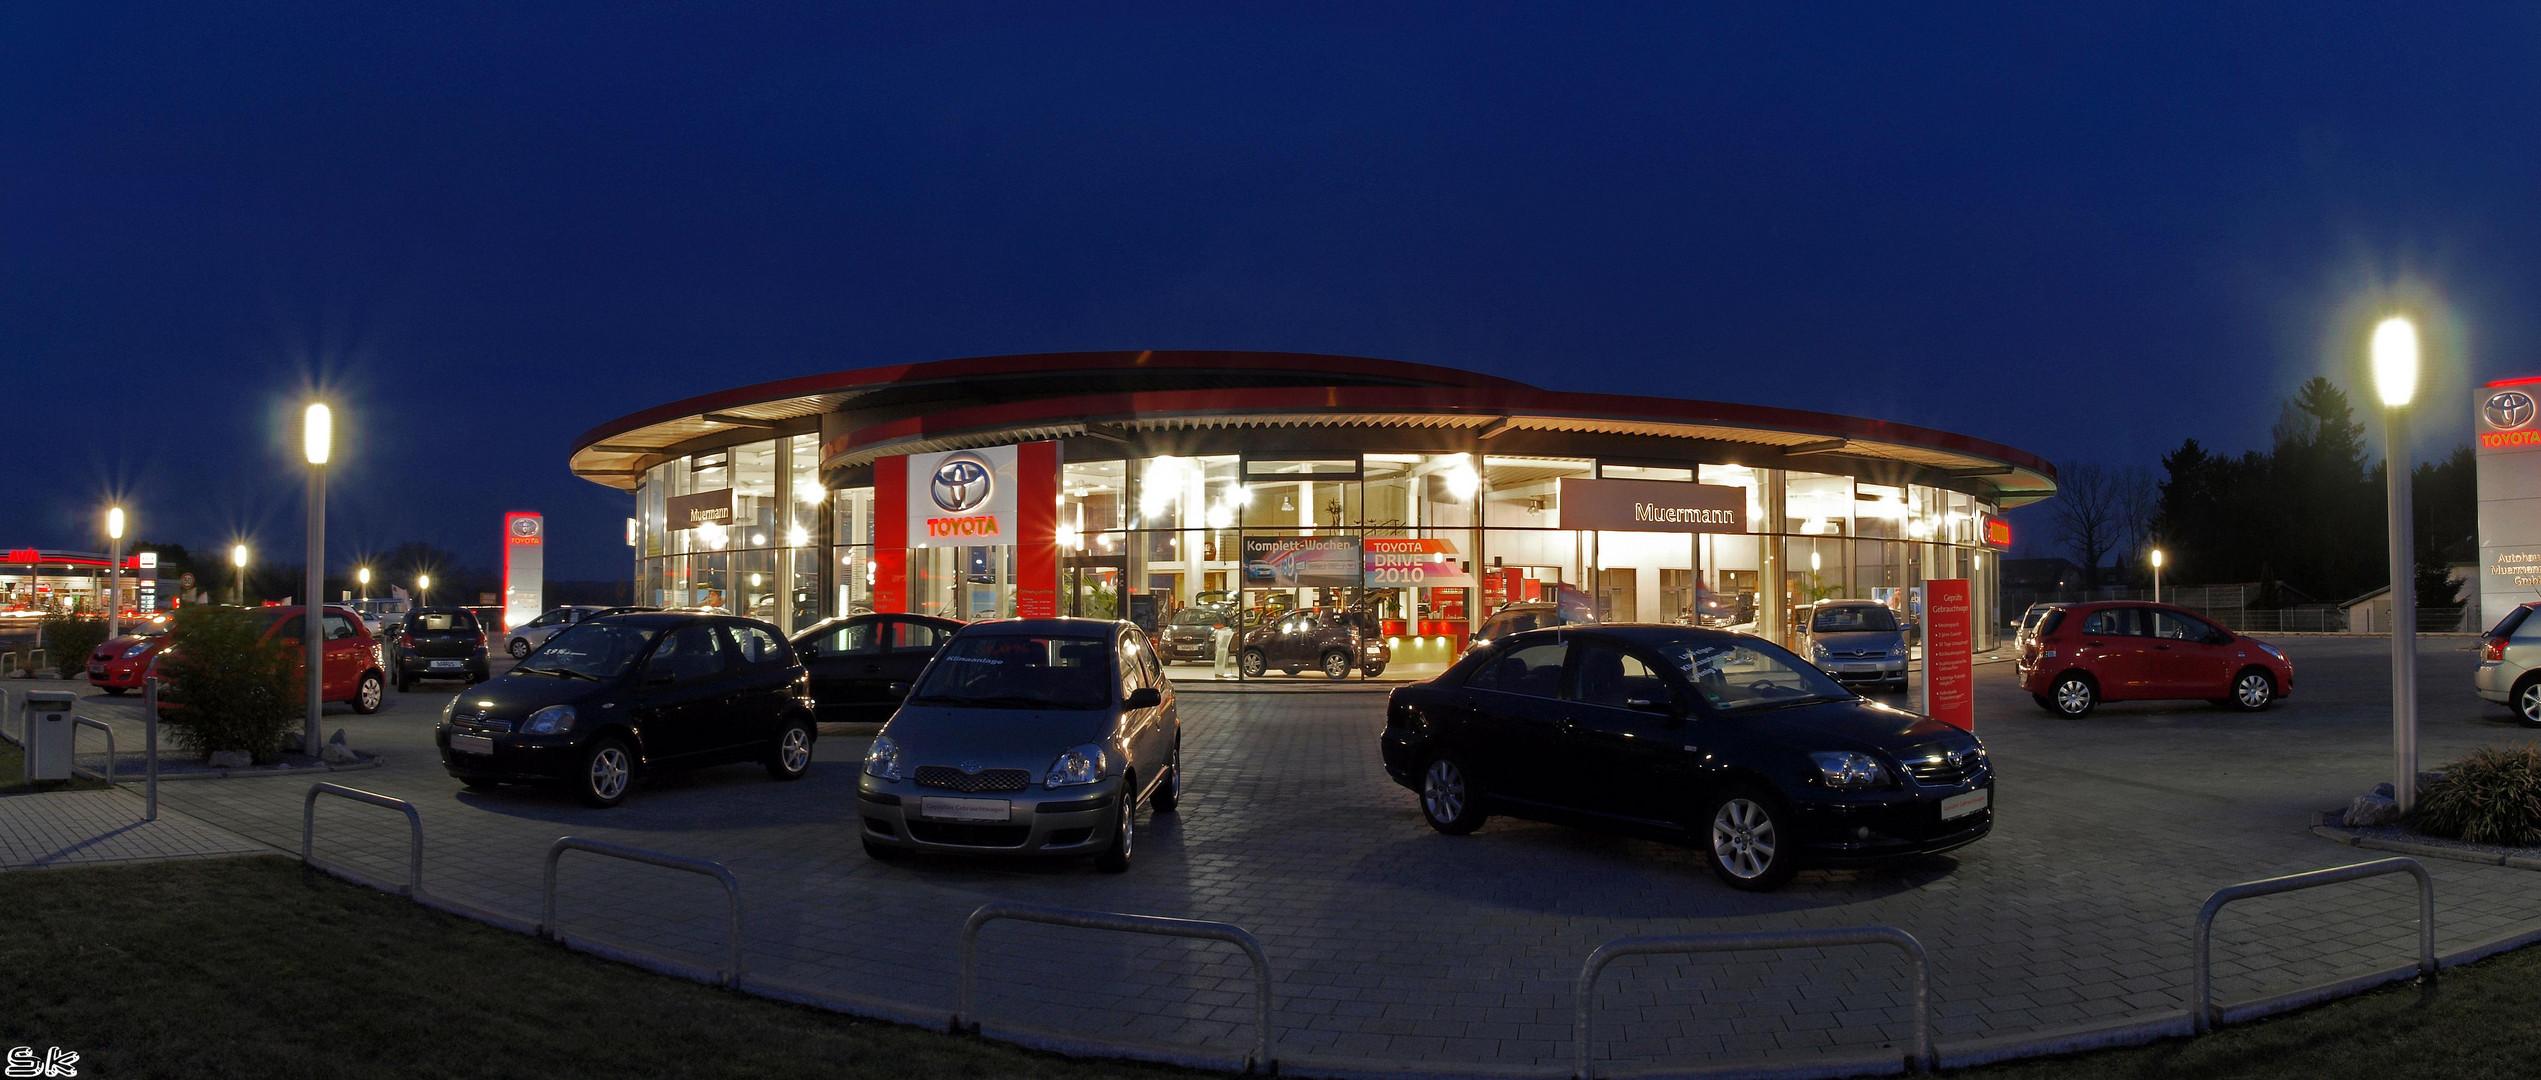 Toyota Muermann